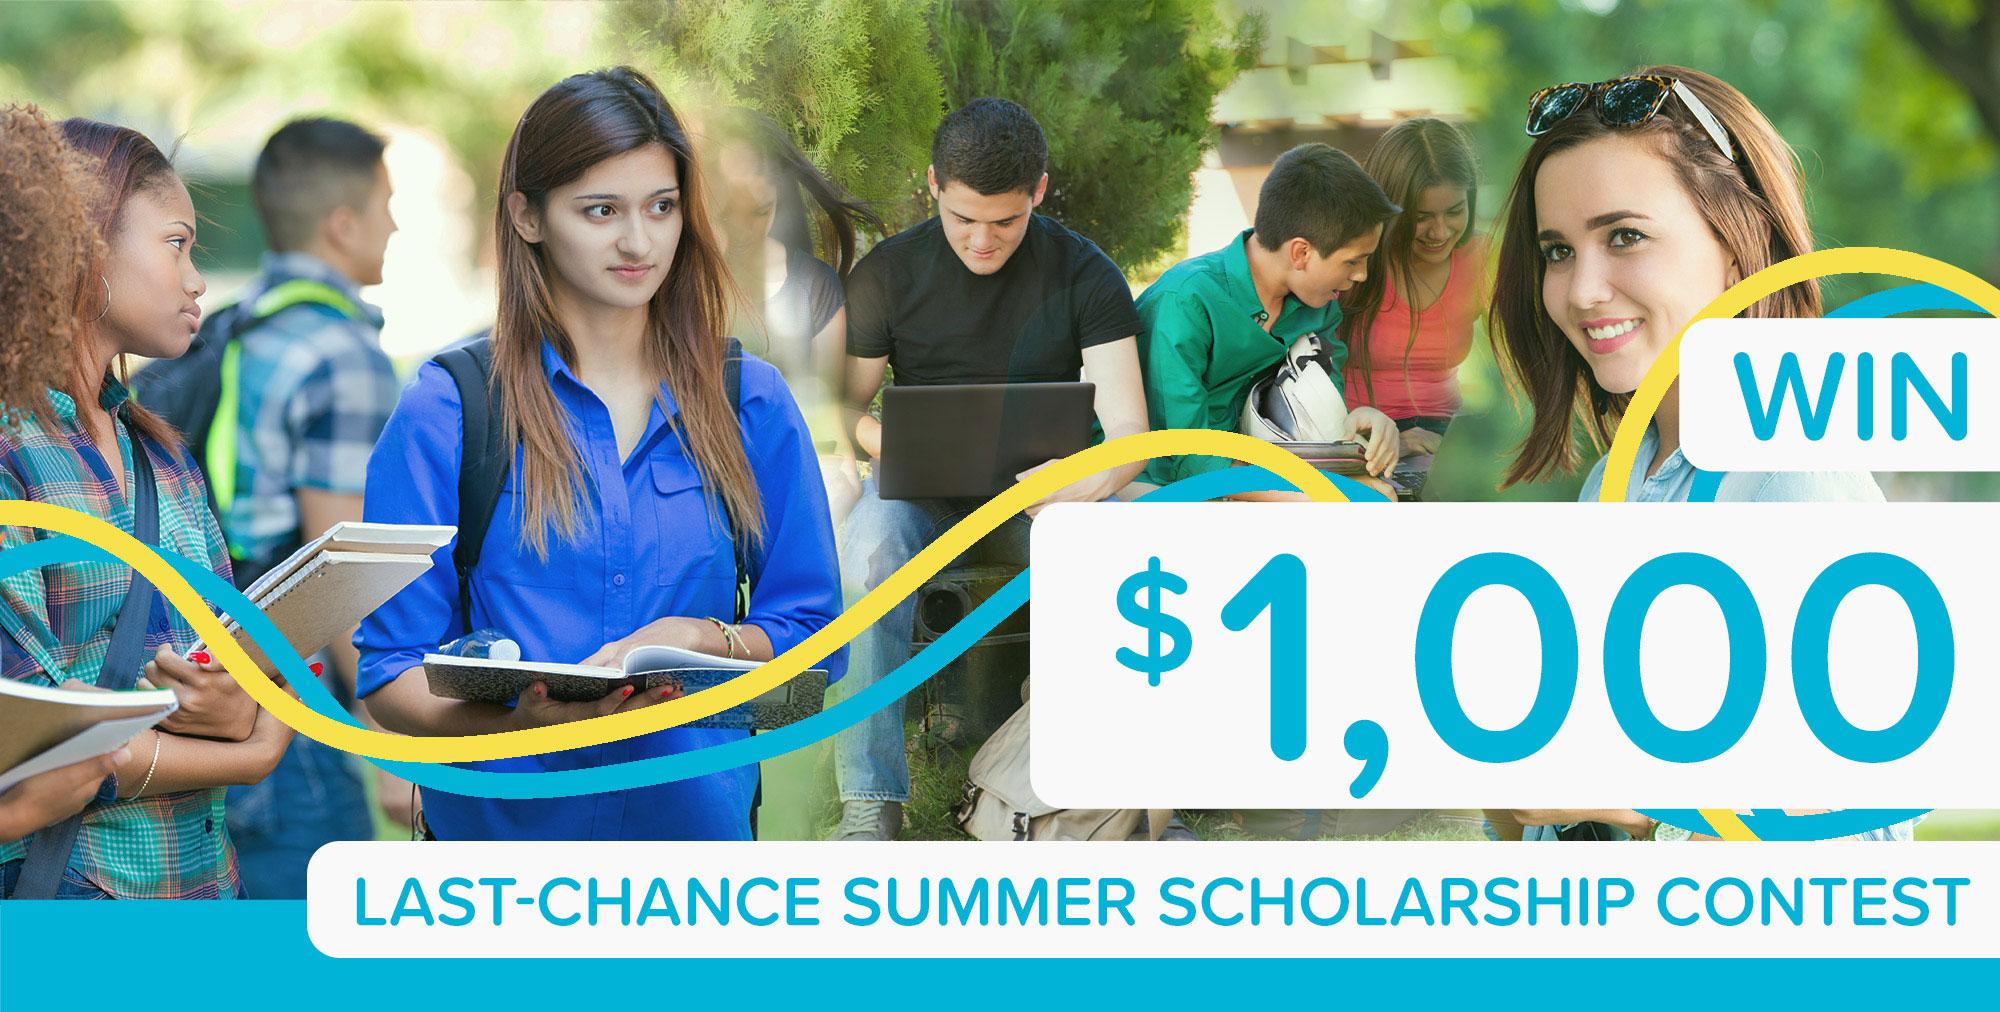 $1,000 Last-Chance Summer Scholarship Contest